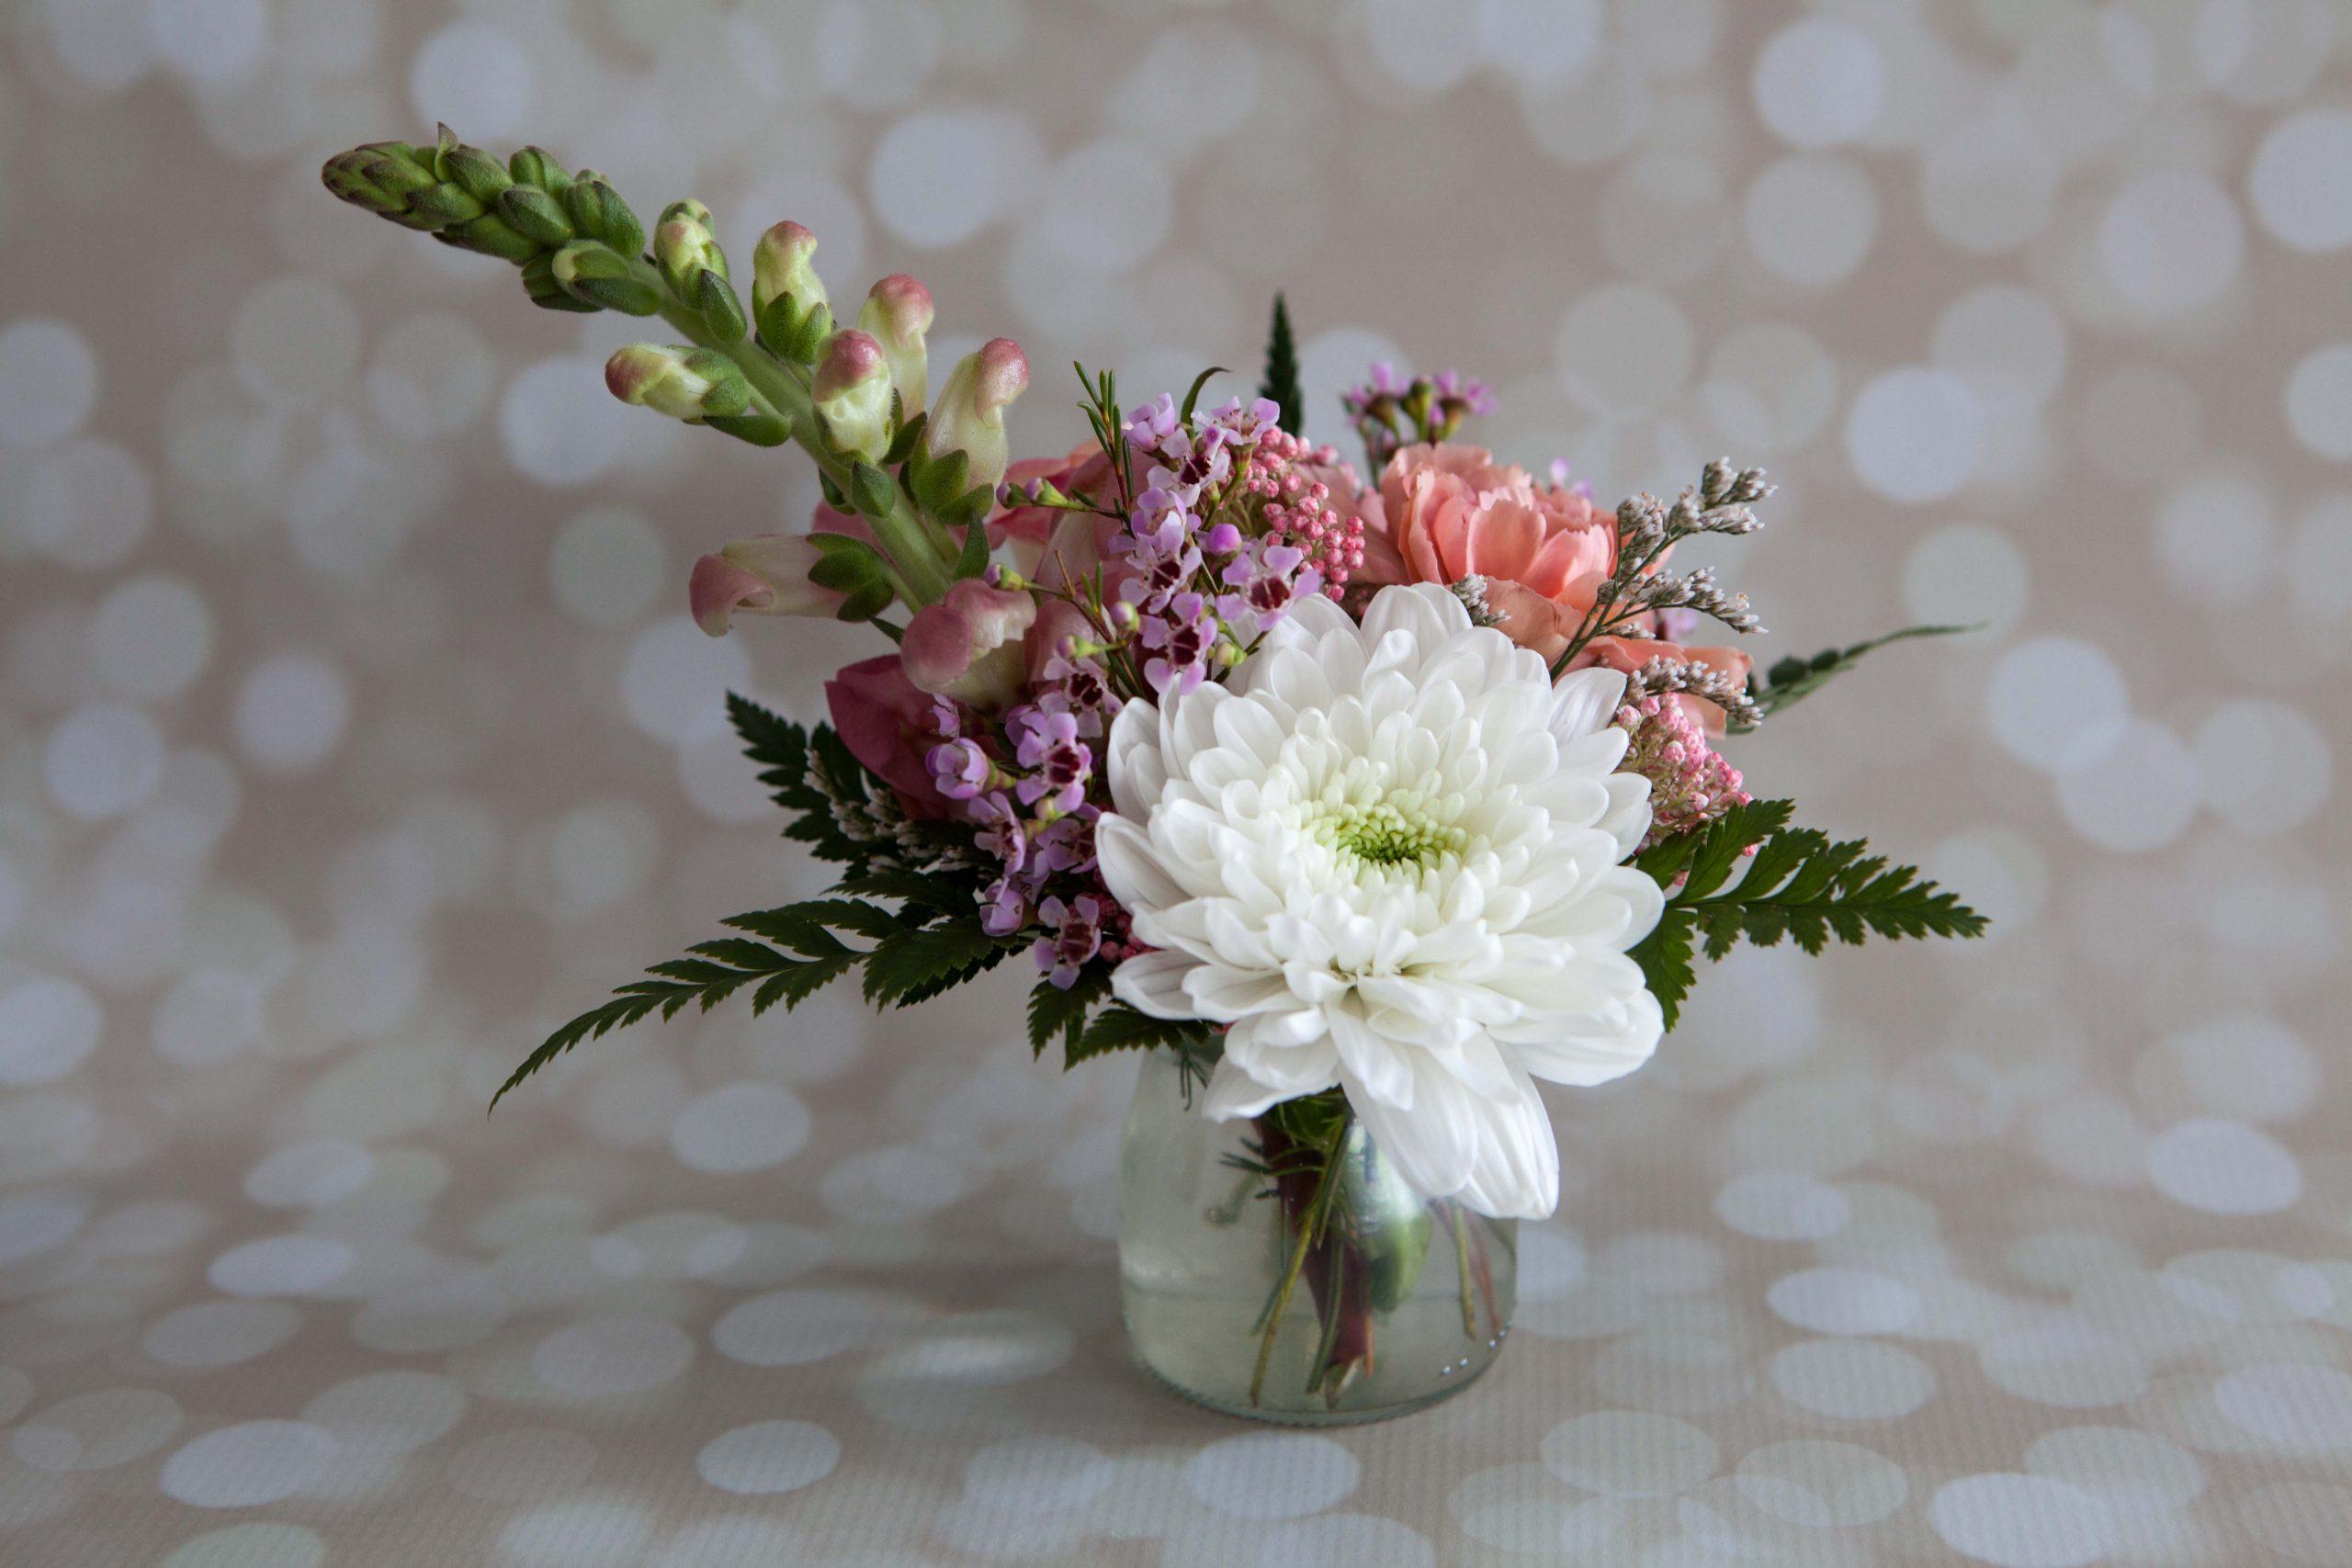 Bootlegger arrangement designed by Anchorage florist Natasha Price of Paper Peony Alaska